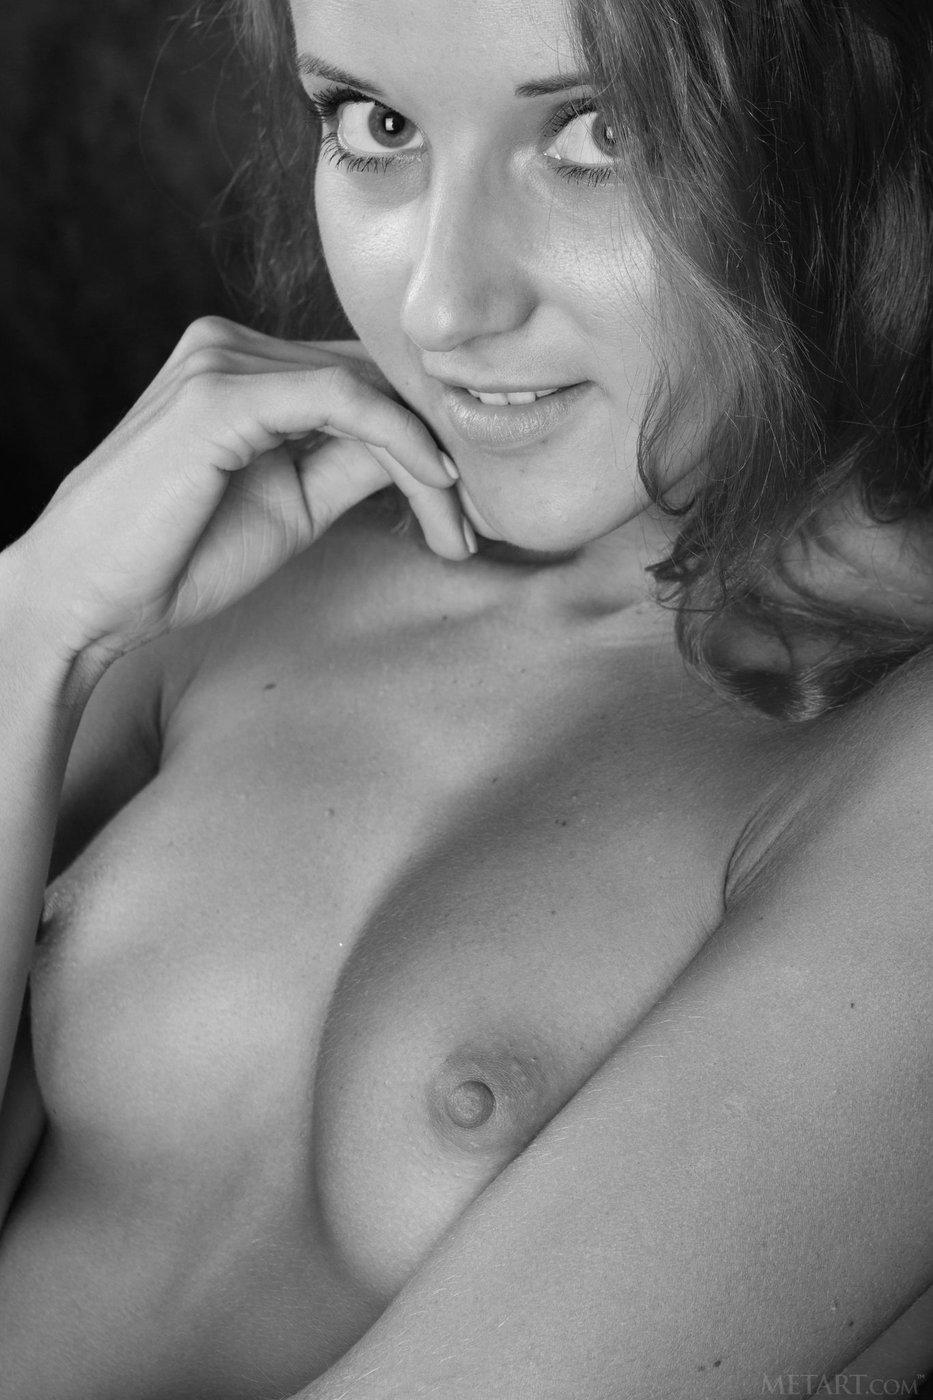 Blonde naked woman playboy